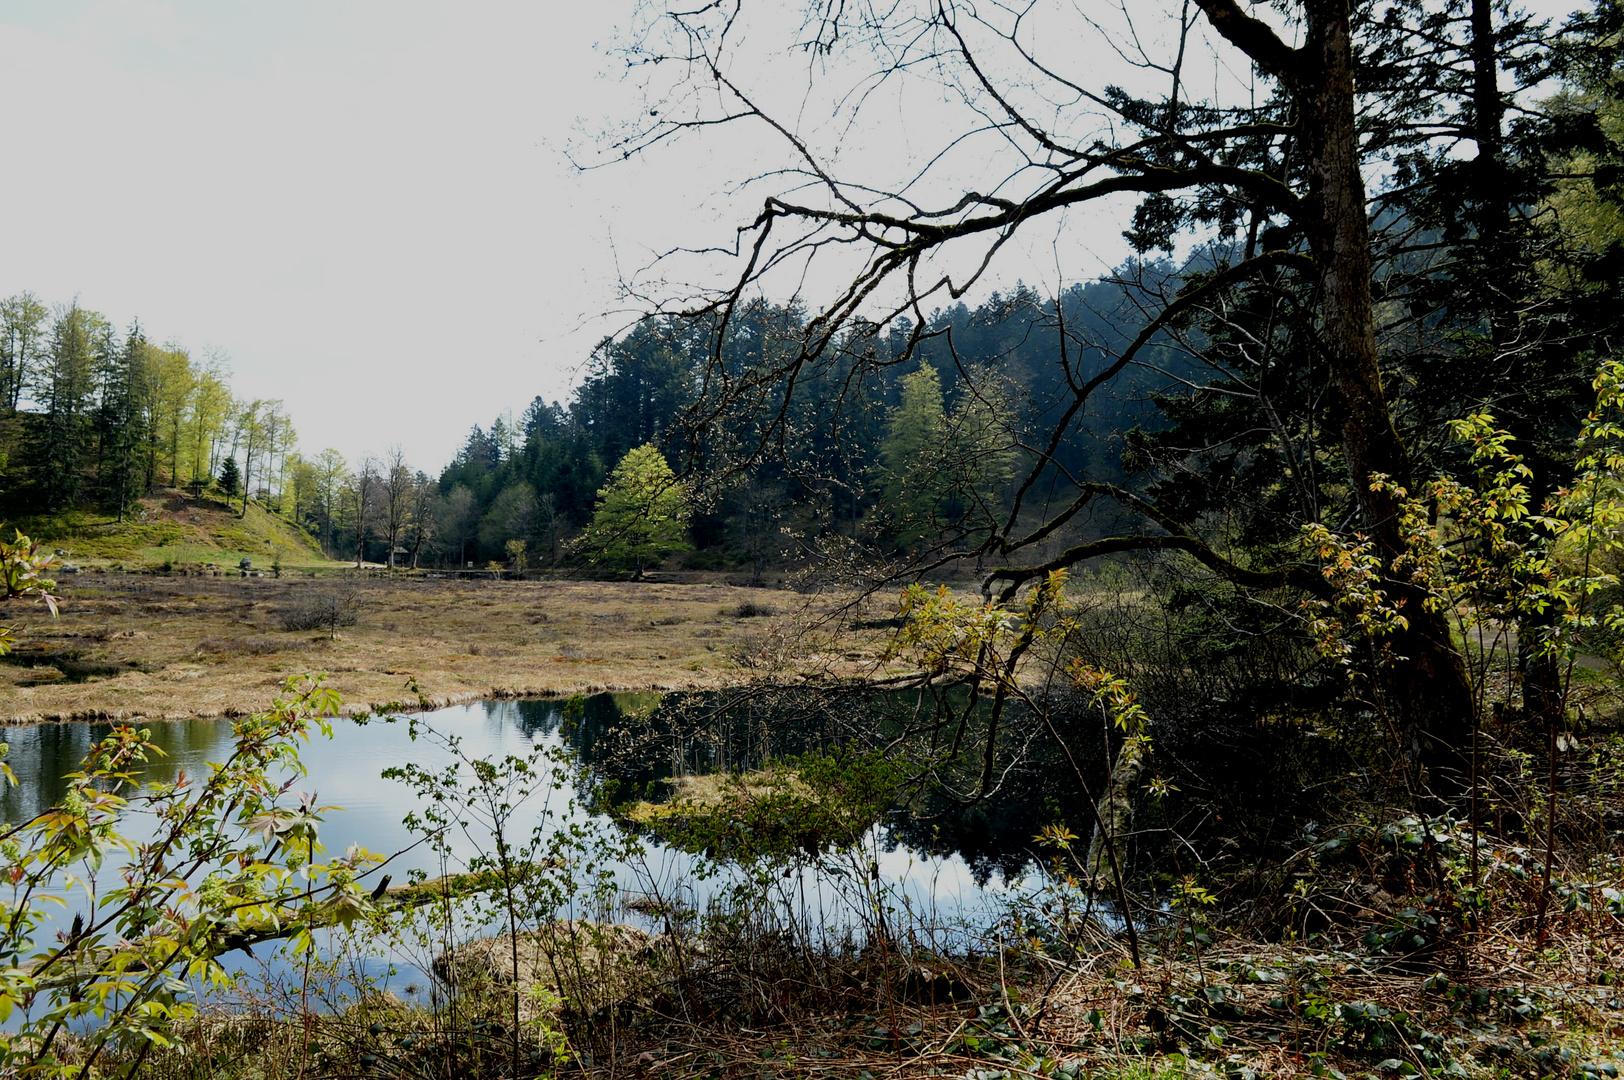 Nonnenmattweiher Südschwarzwald II